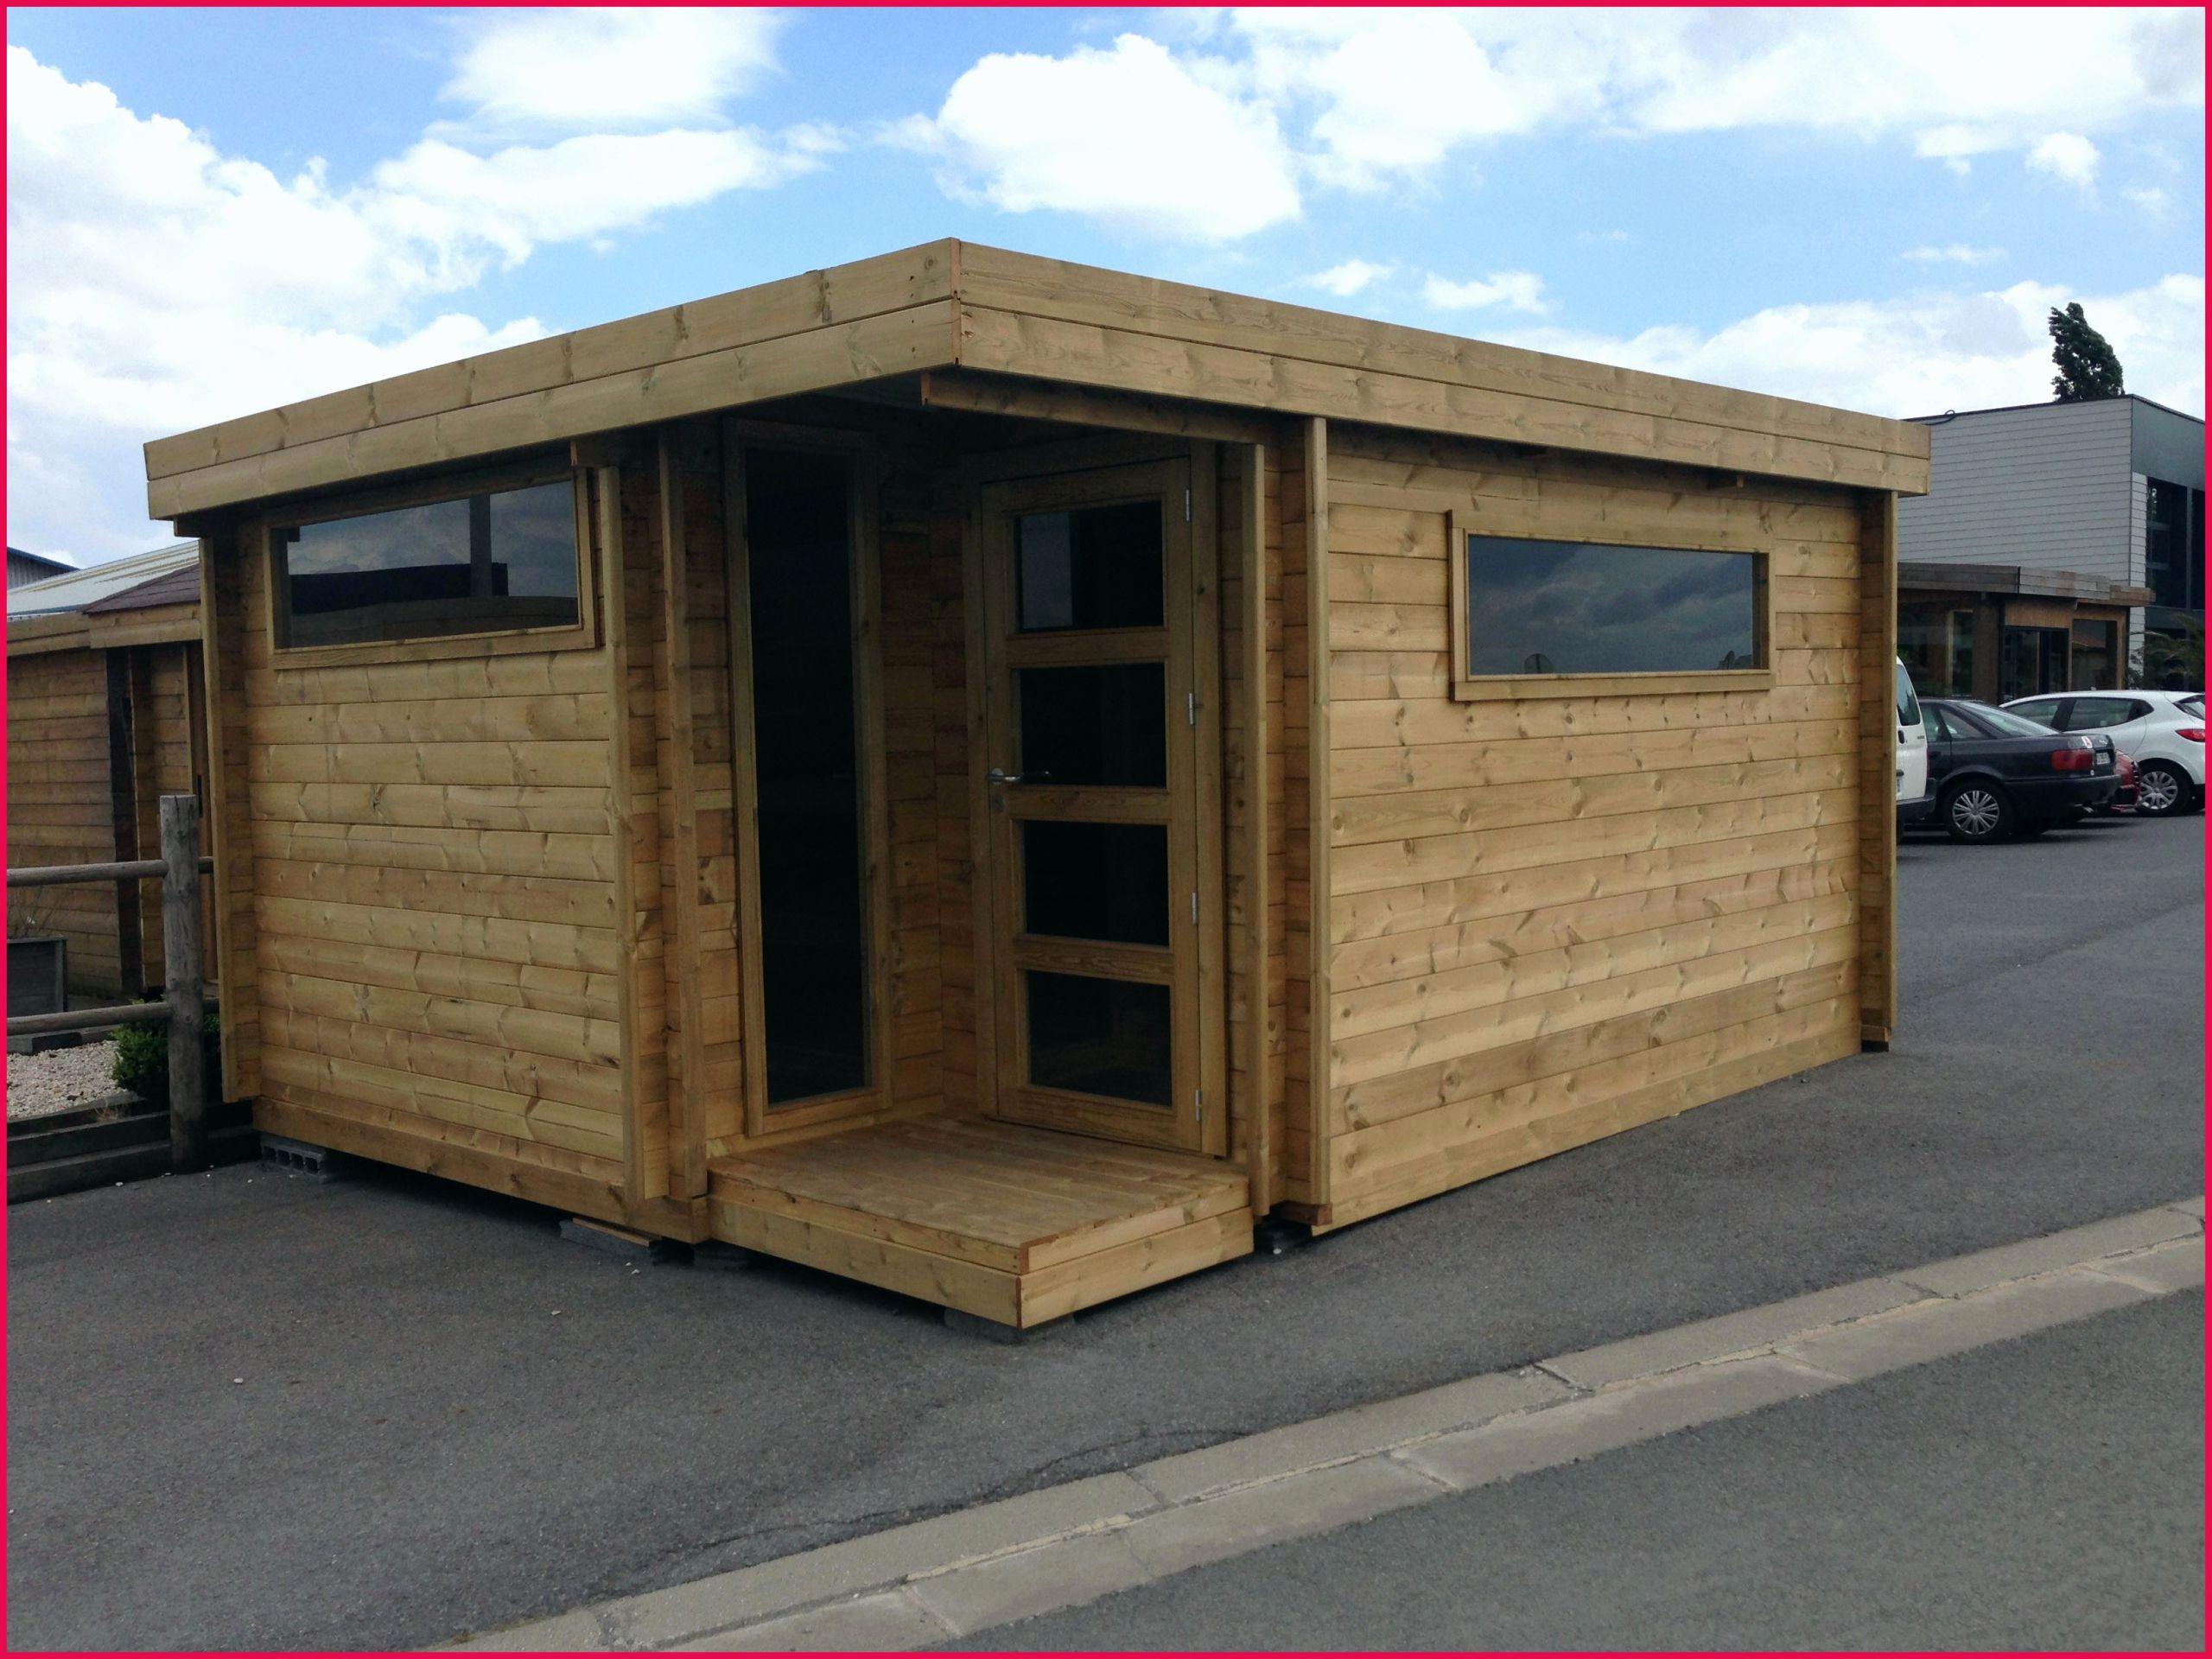 construire un toit terrasse unique unique 40 de construire abri jardin bois concept of construire un toit terrasse